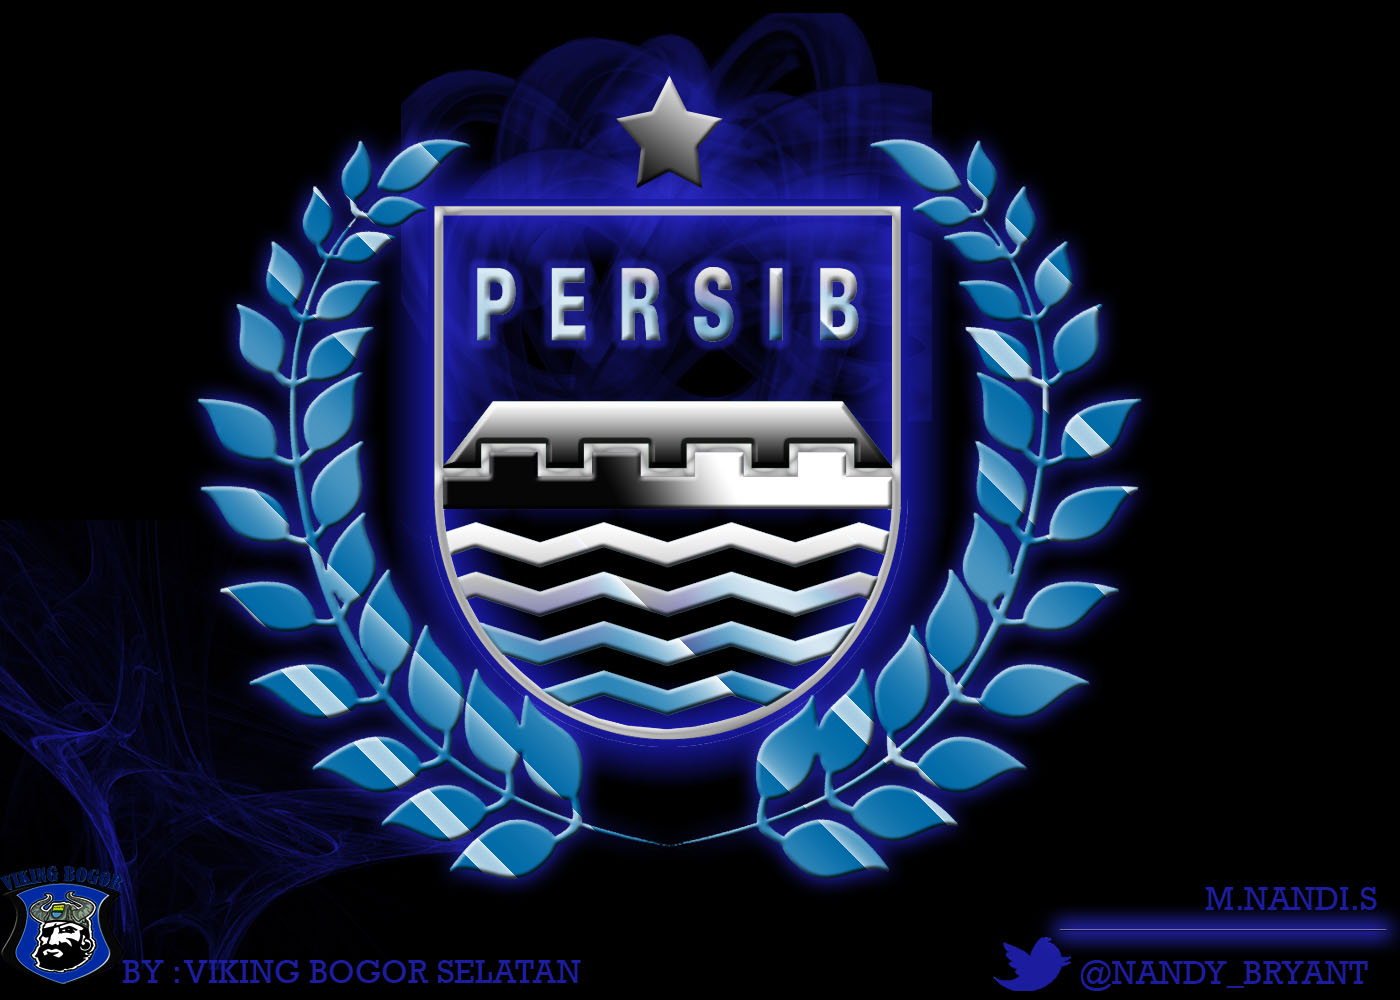 Persib Persib Bandung 460700 Hd Wallpaper Backgrounds